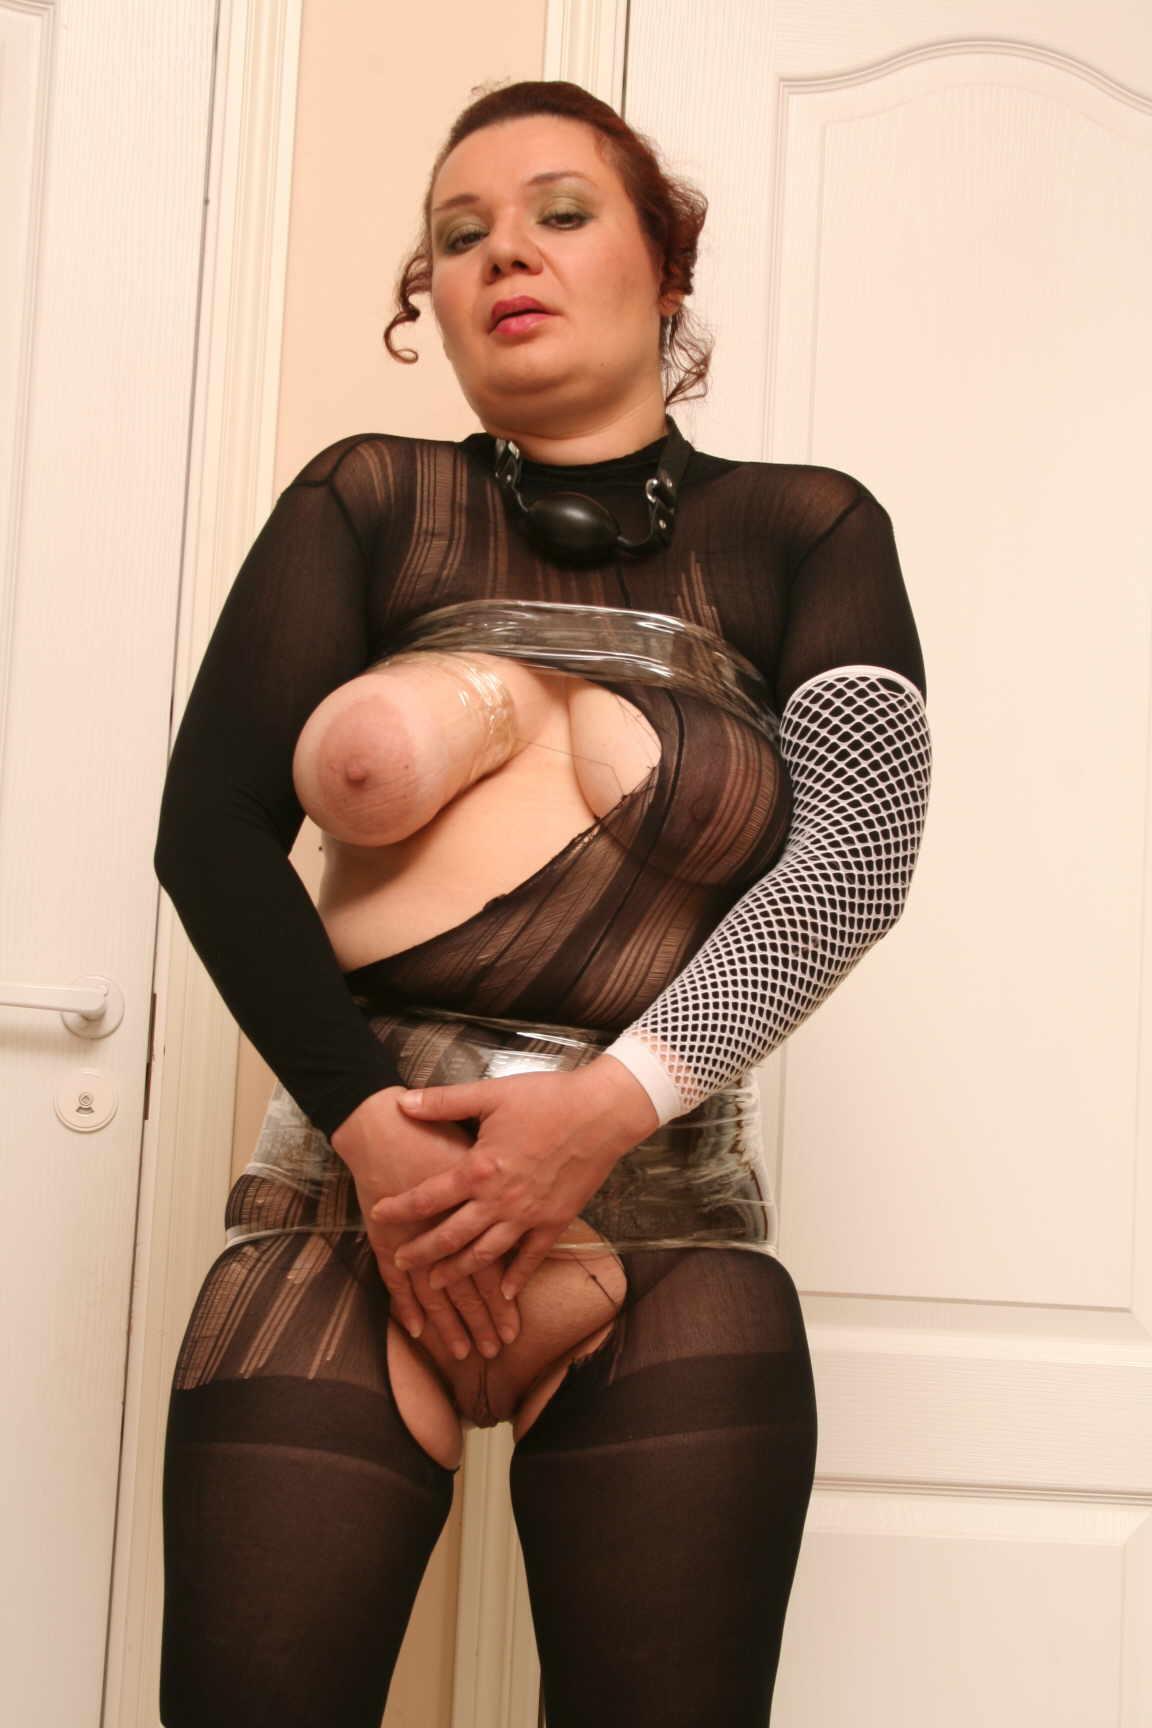 Ugly woman big tits #4